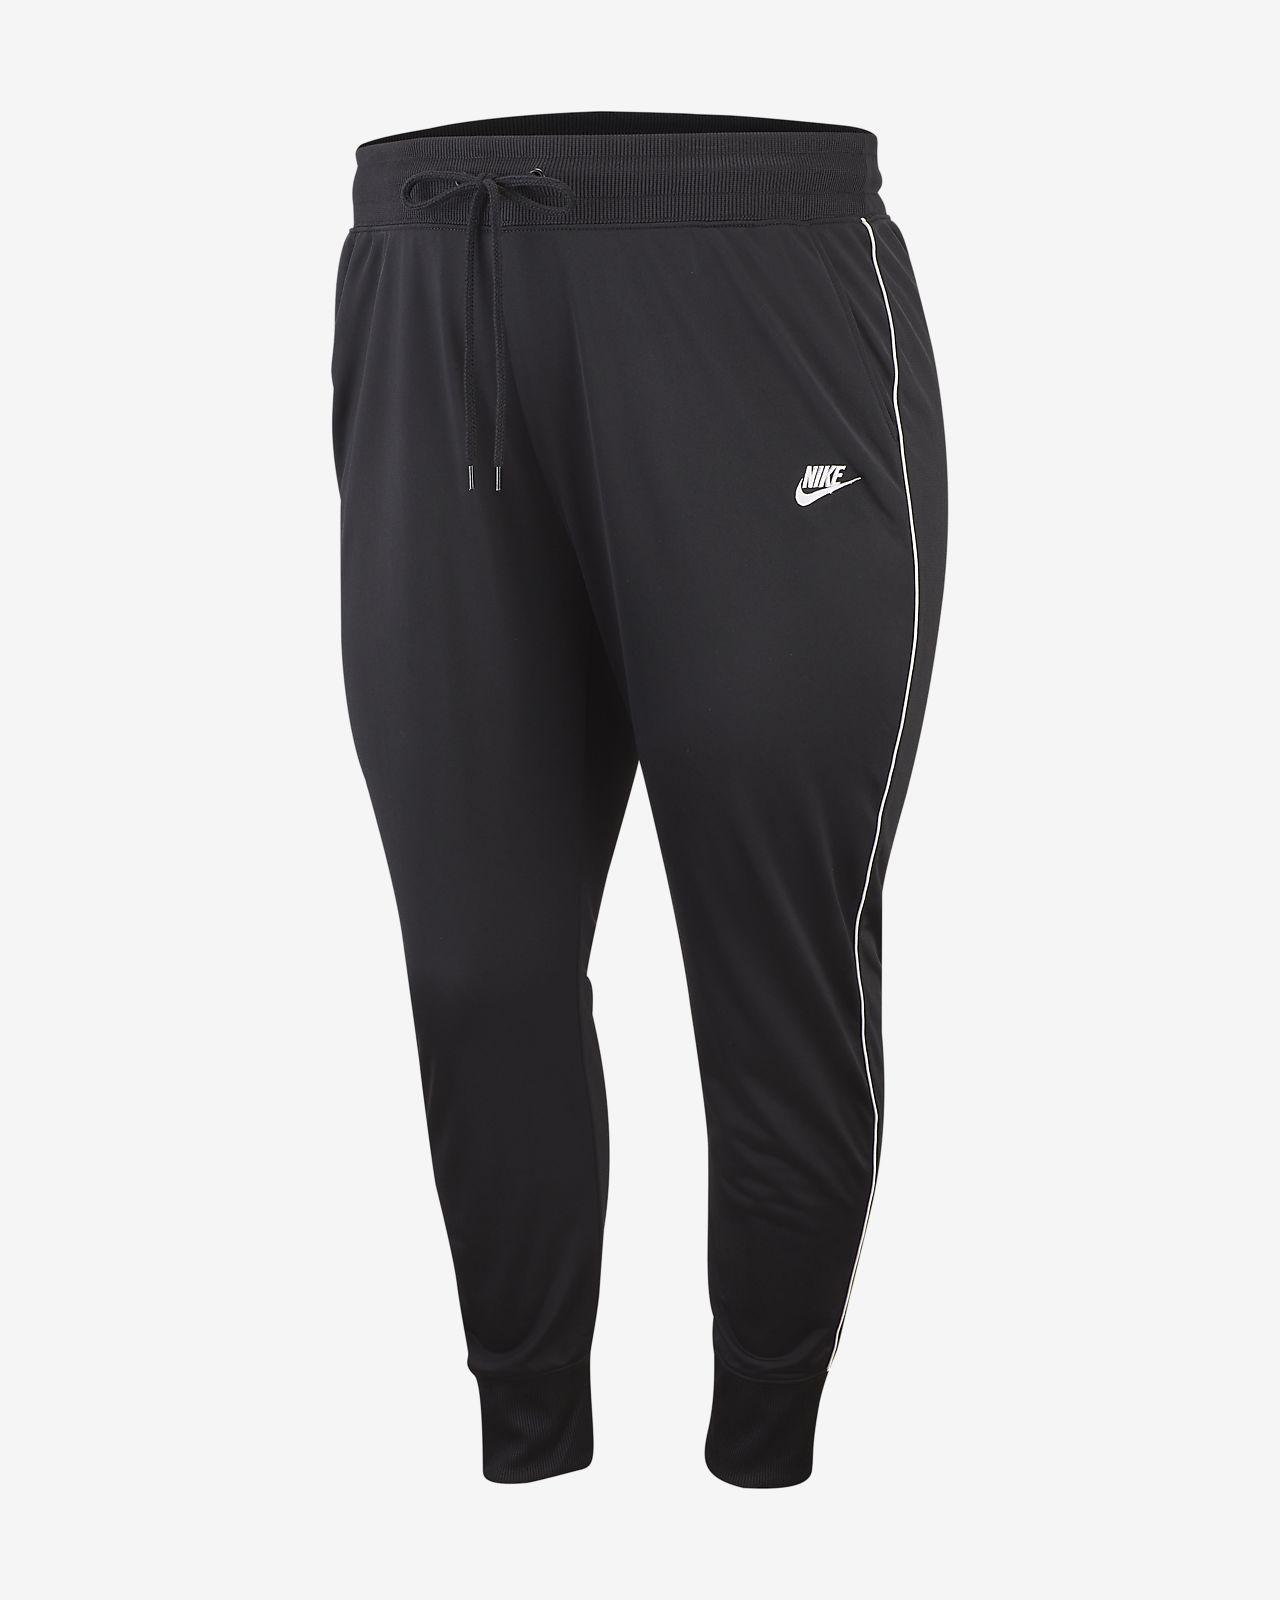 c08676c52172 Nike Sportswear Heritage Women s Joggers (Plus Size). Nike.com